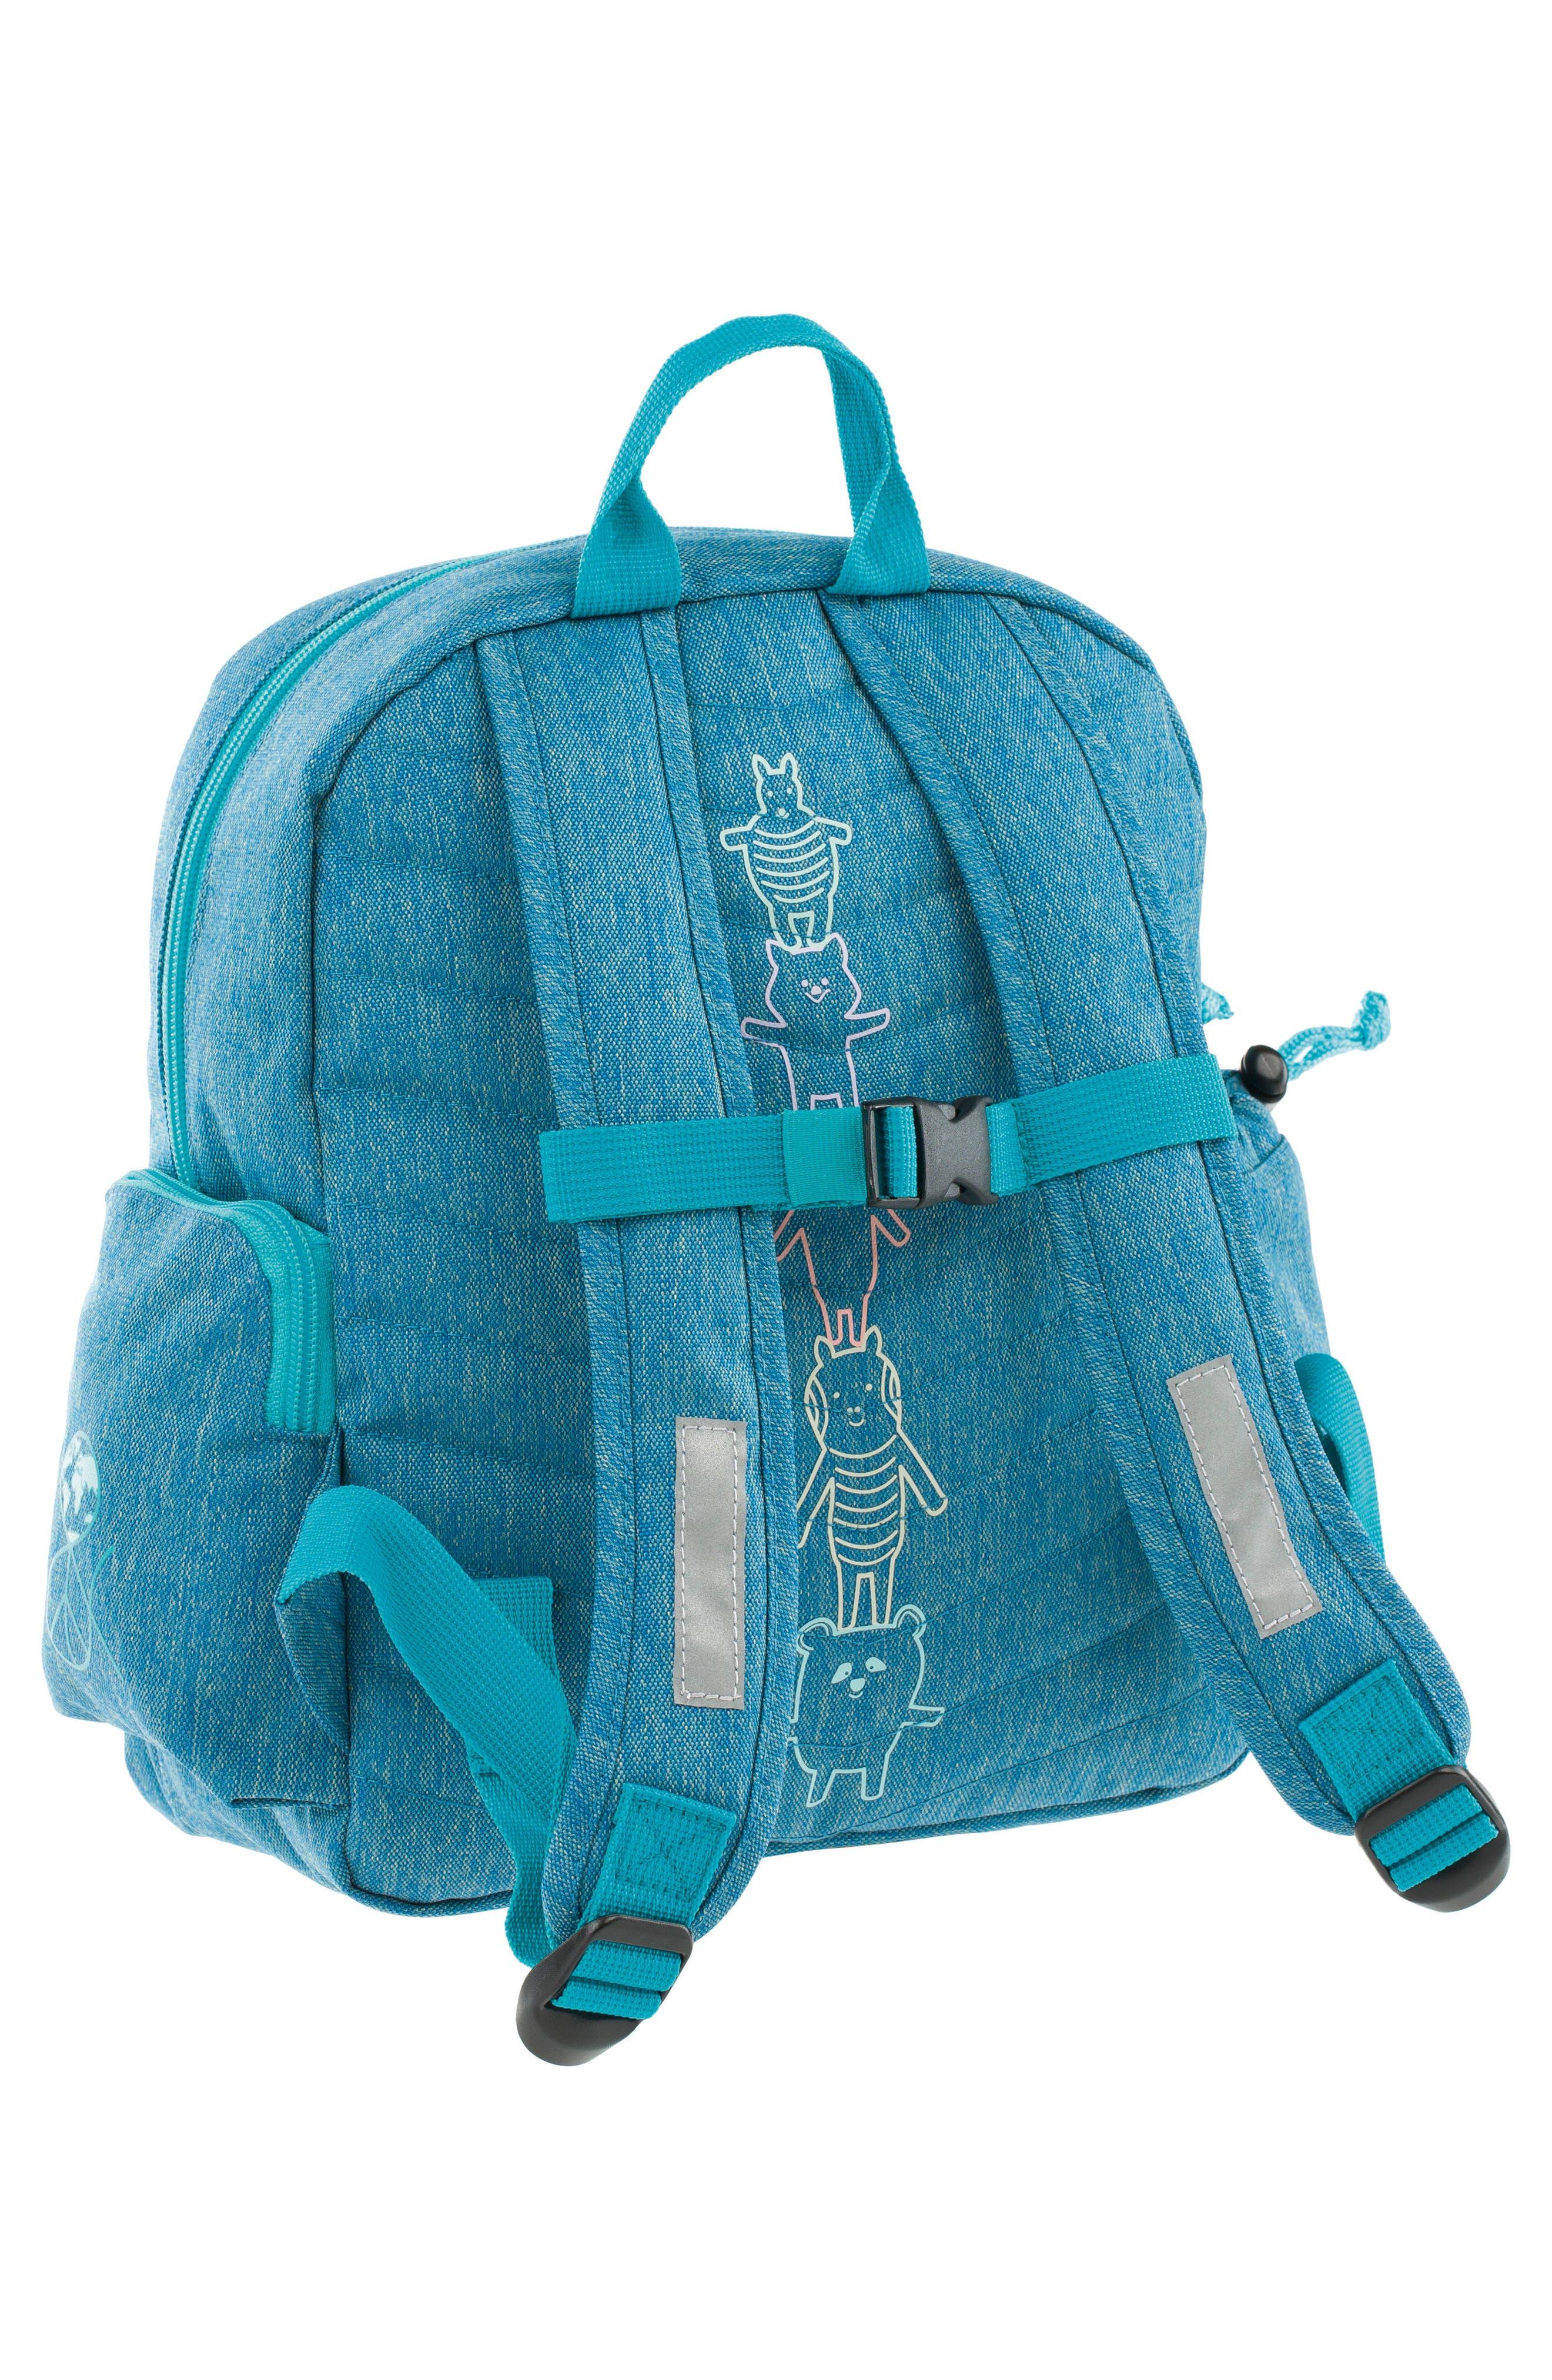 Medium About Friends Backpack,                             Alternate thumbnail 2, color,                             Melange Blue